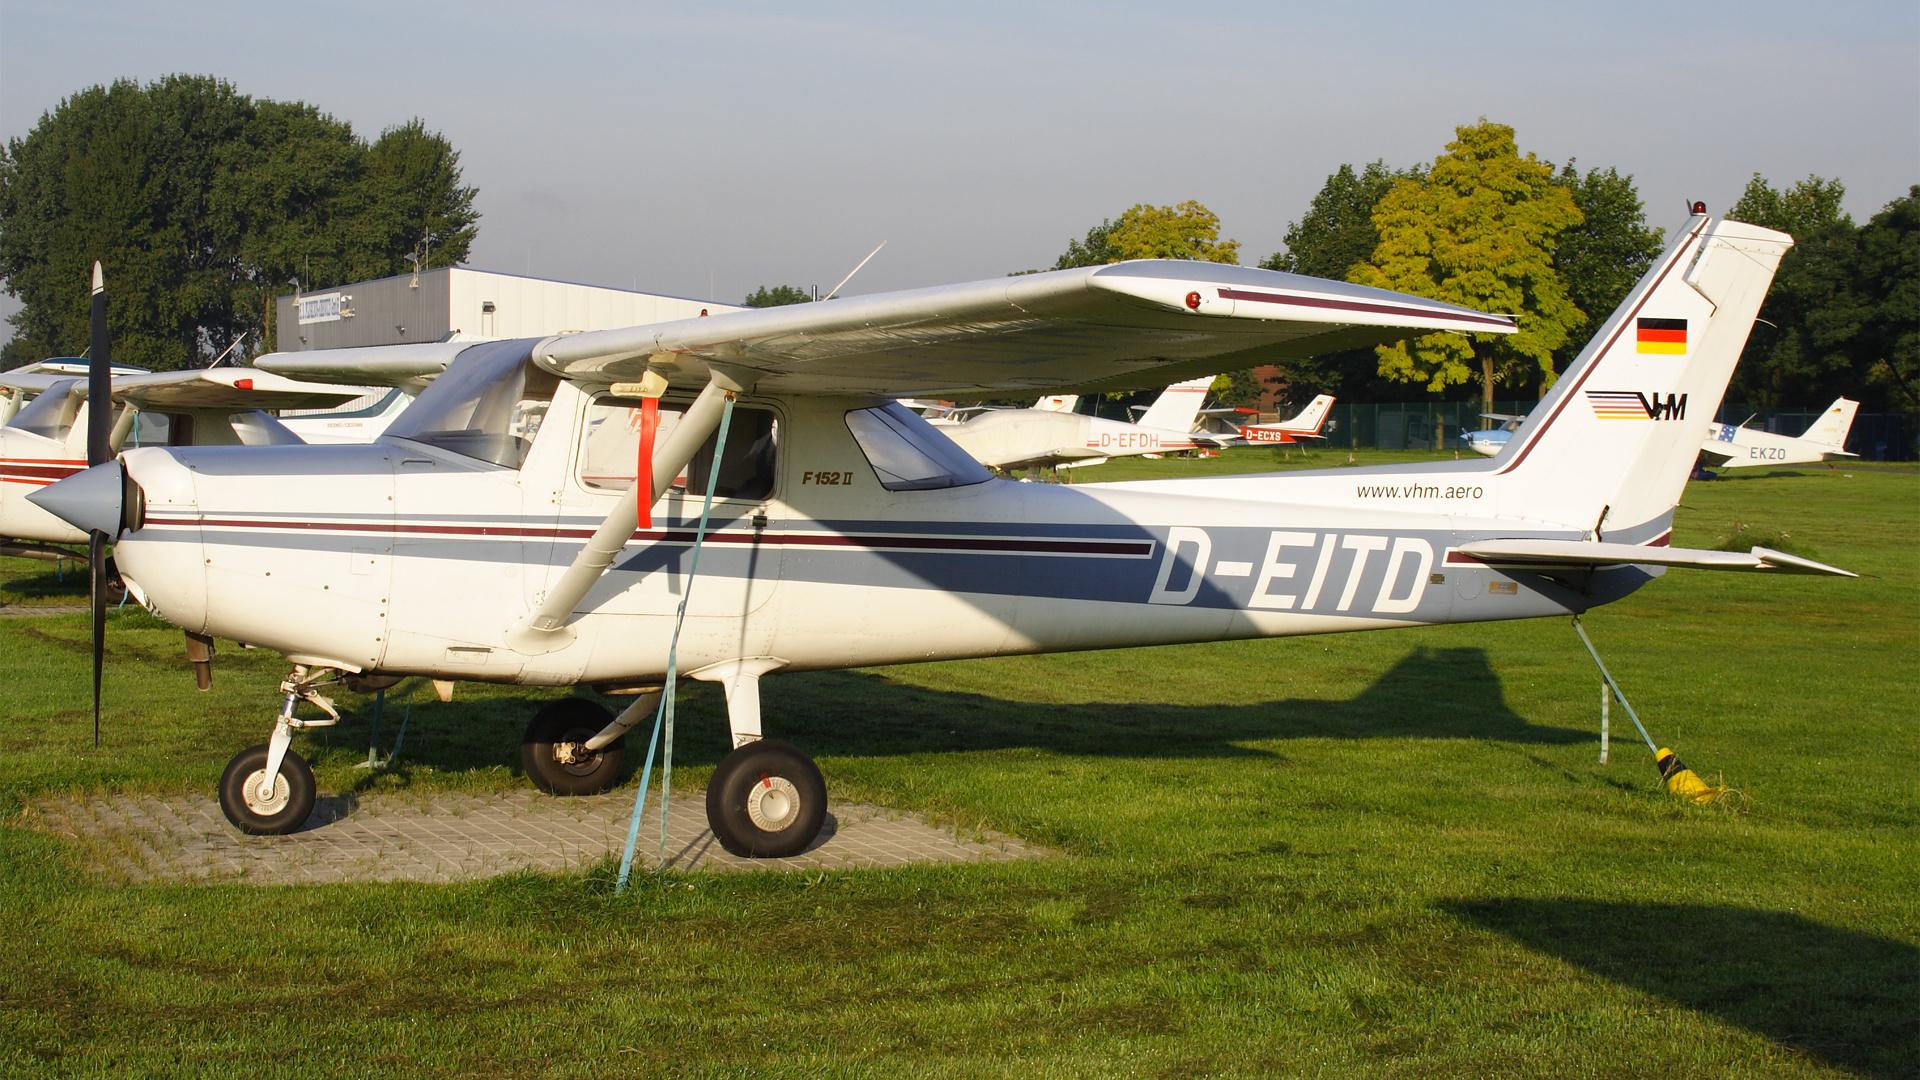 D-EITD-1 C152  ESS 200808